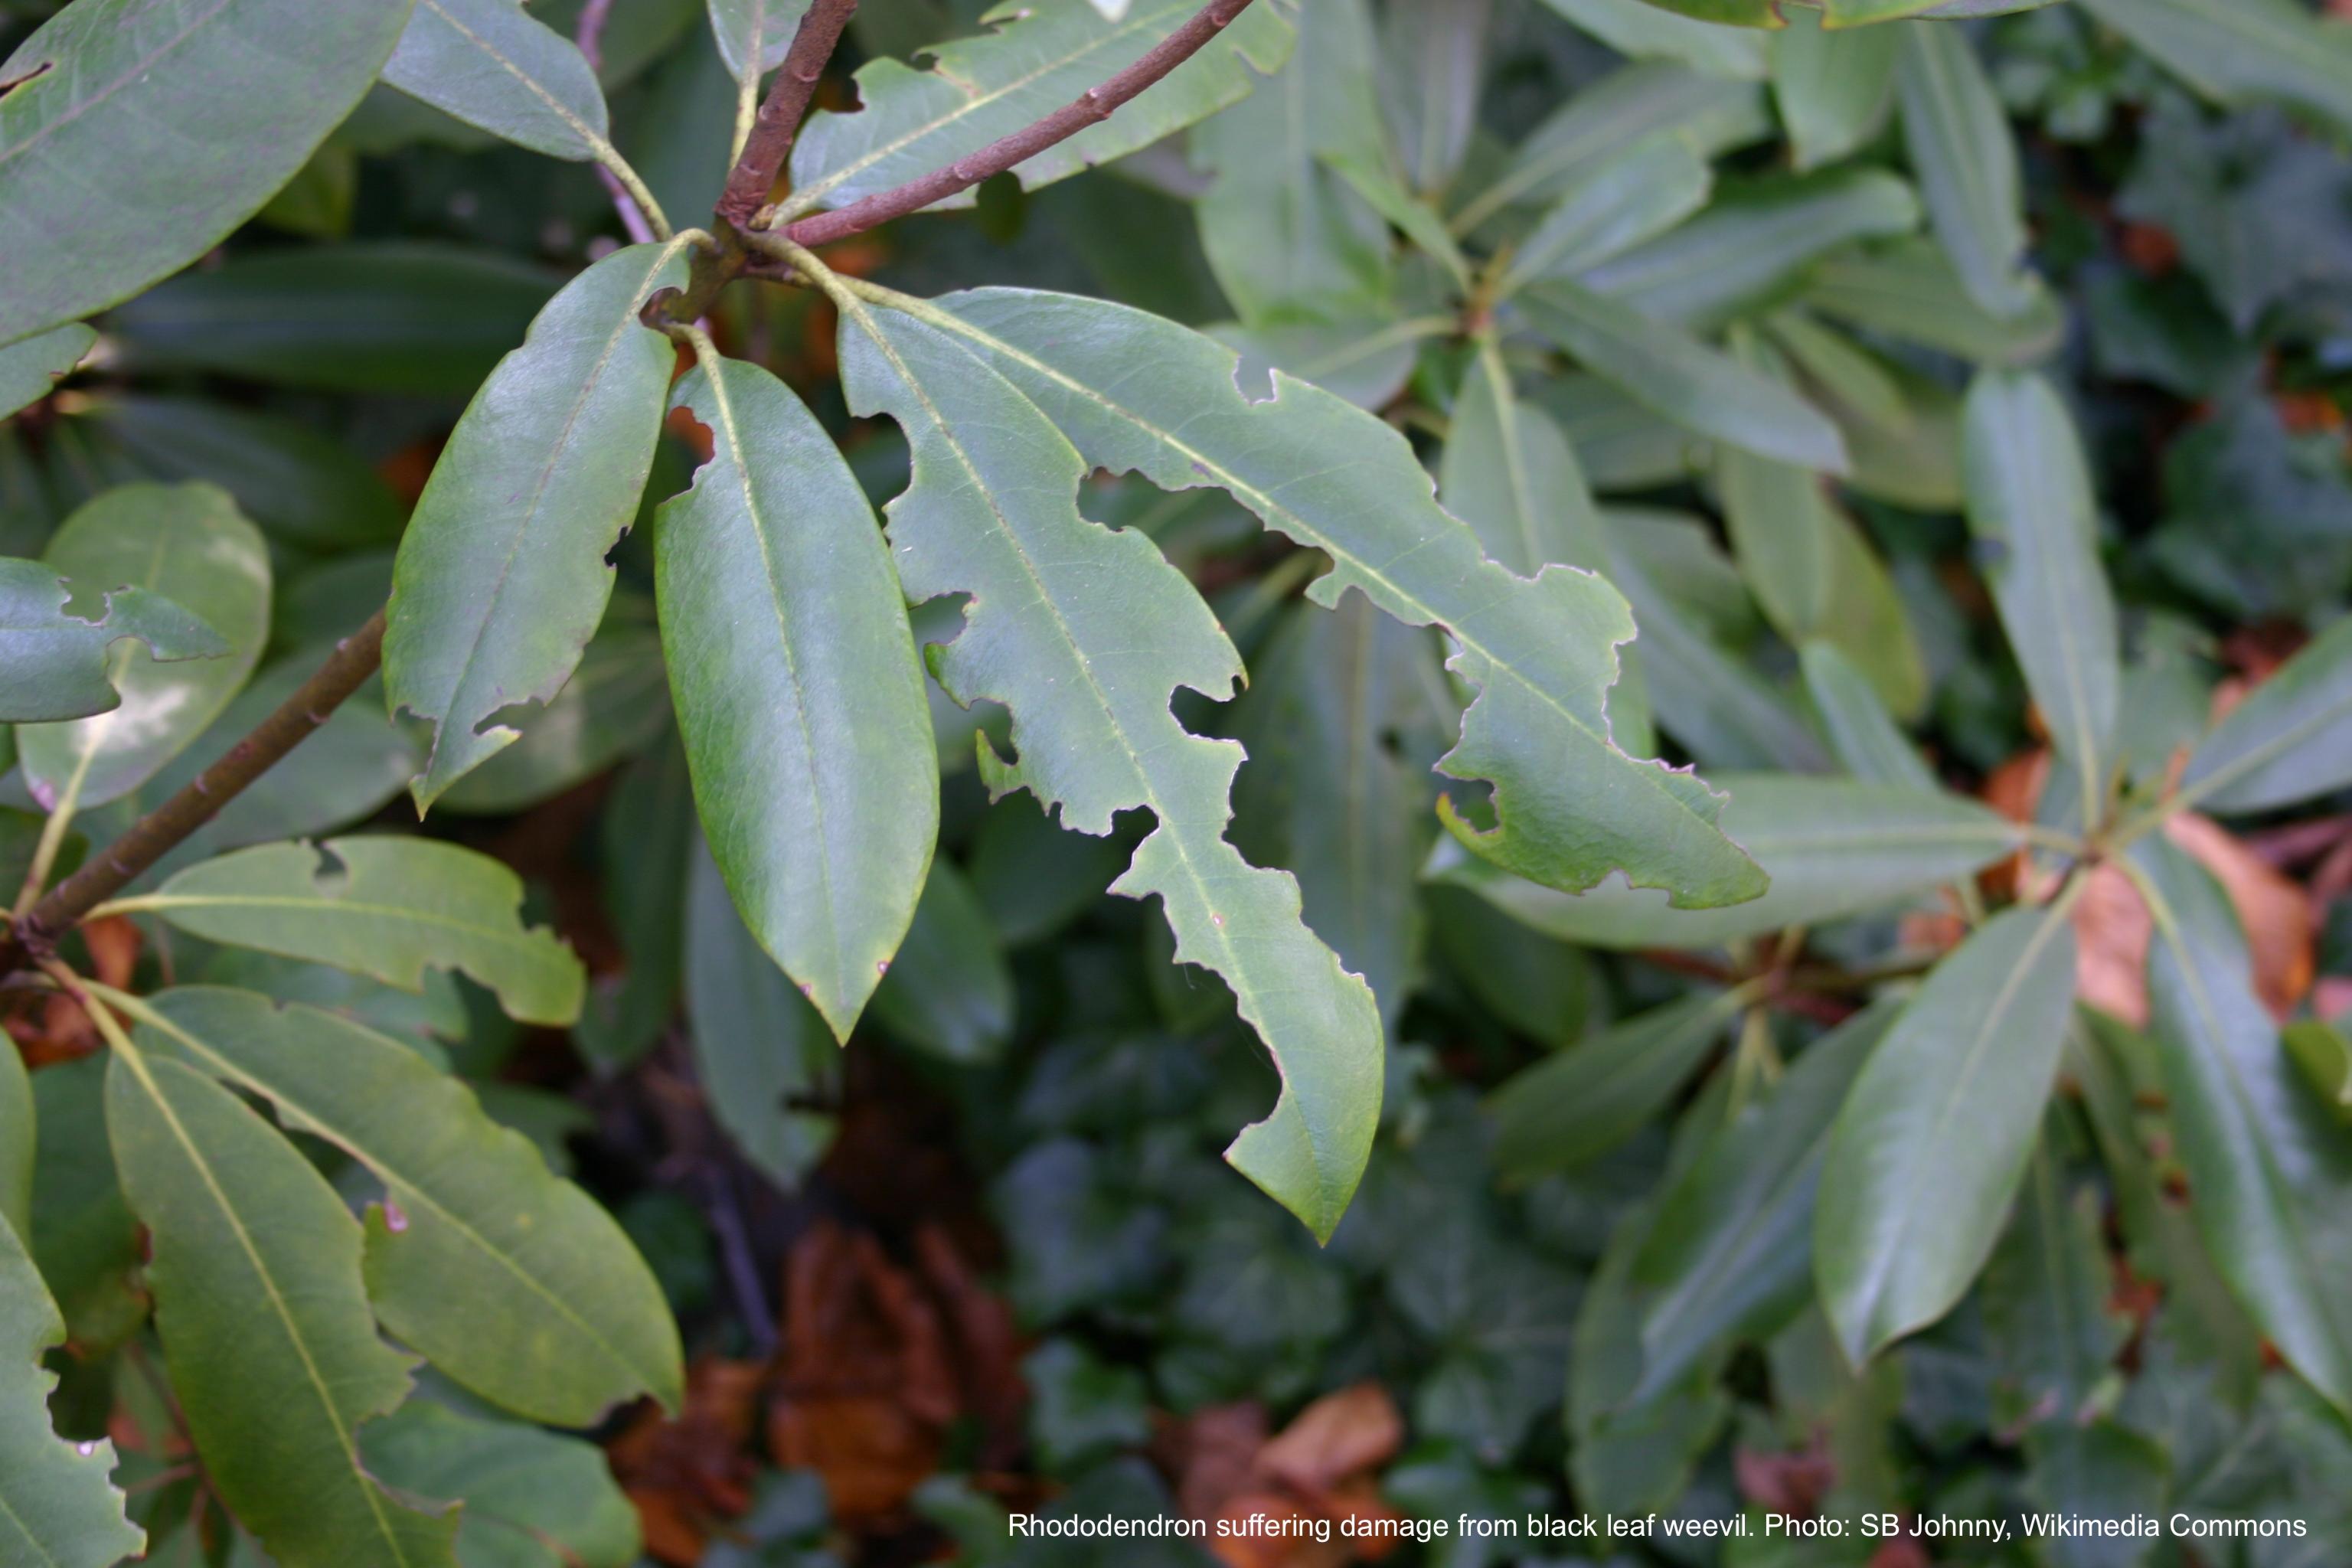 Rhododendron leaves showing black vine weevil damage.